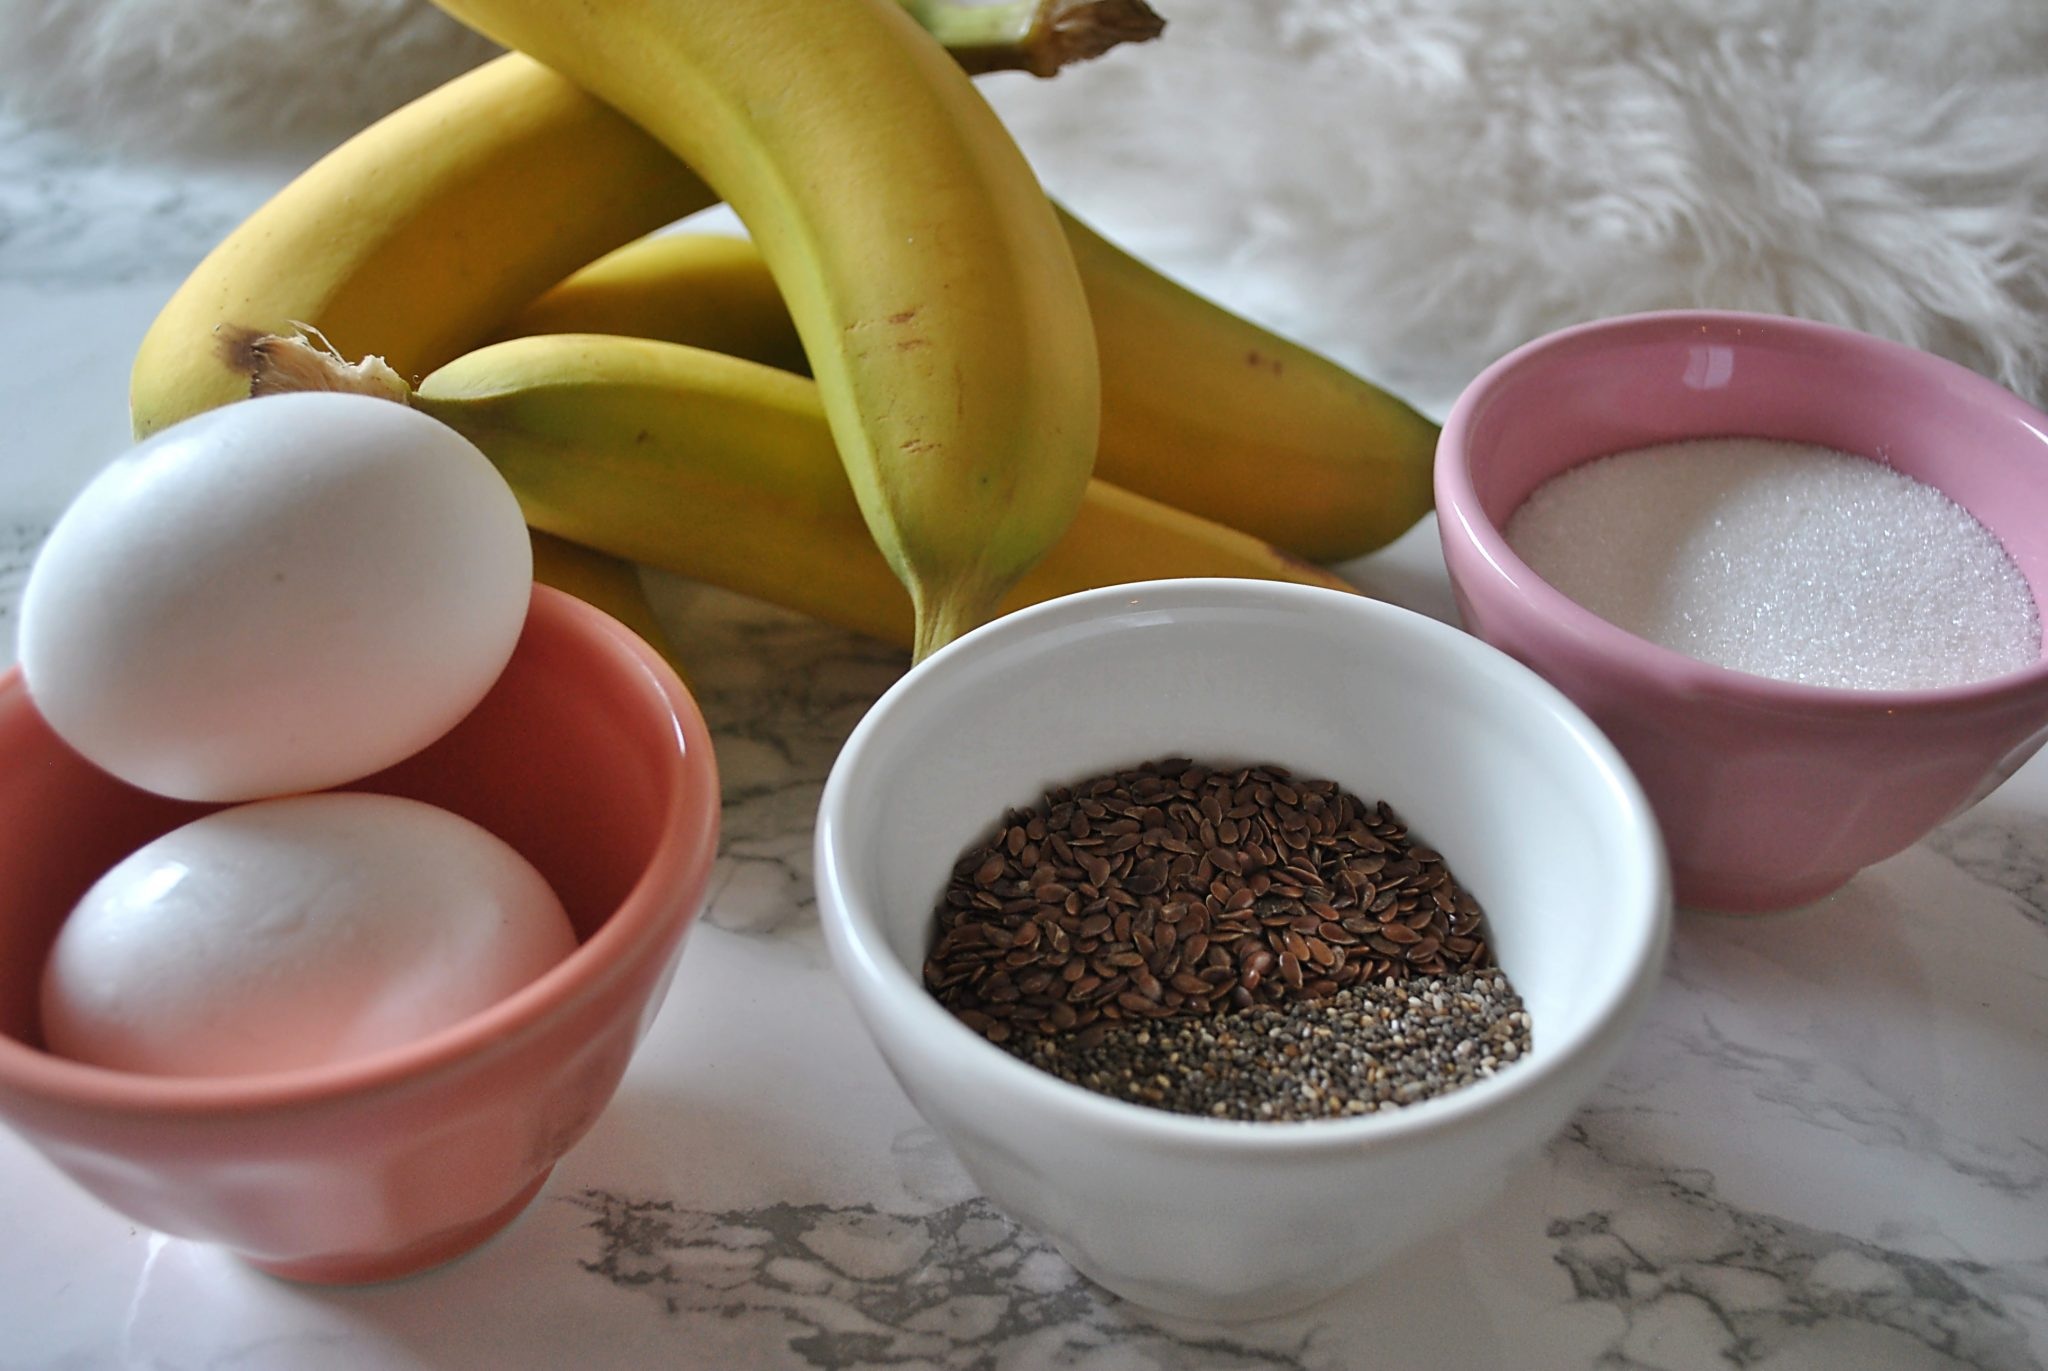 The-Hungarian-Brunette-Super-Banana-Bread-Ingredients-2.jpg